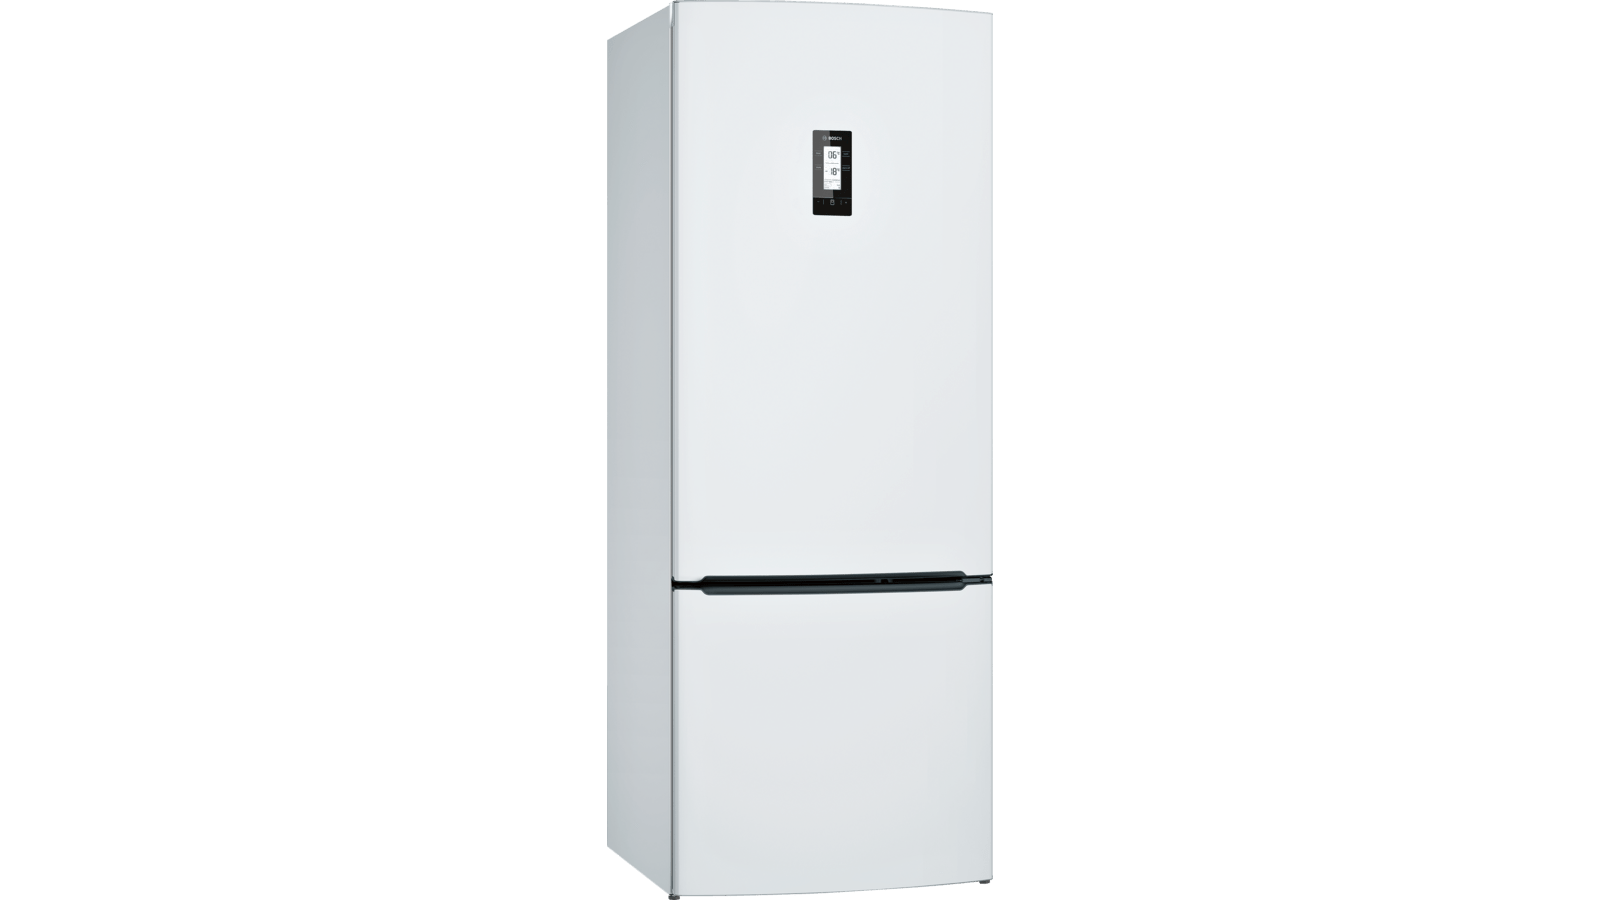 Serie 6 Alttan Donduruculu Buzdolabi 185 X 70 Cm Beyaz Kgn57pw23n